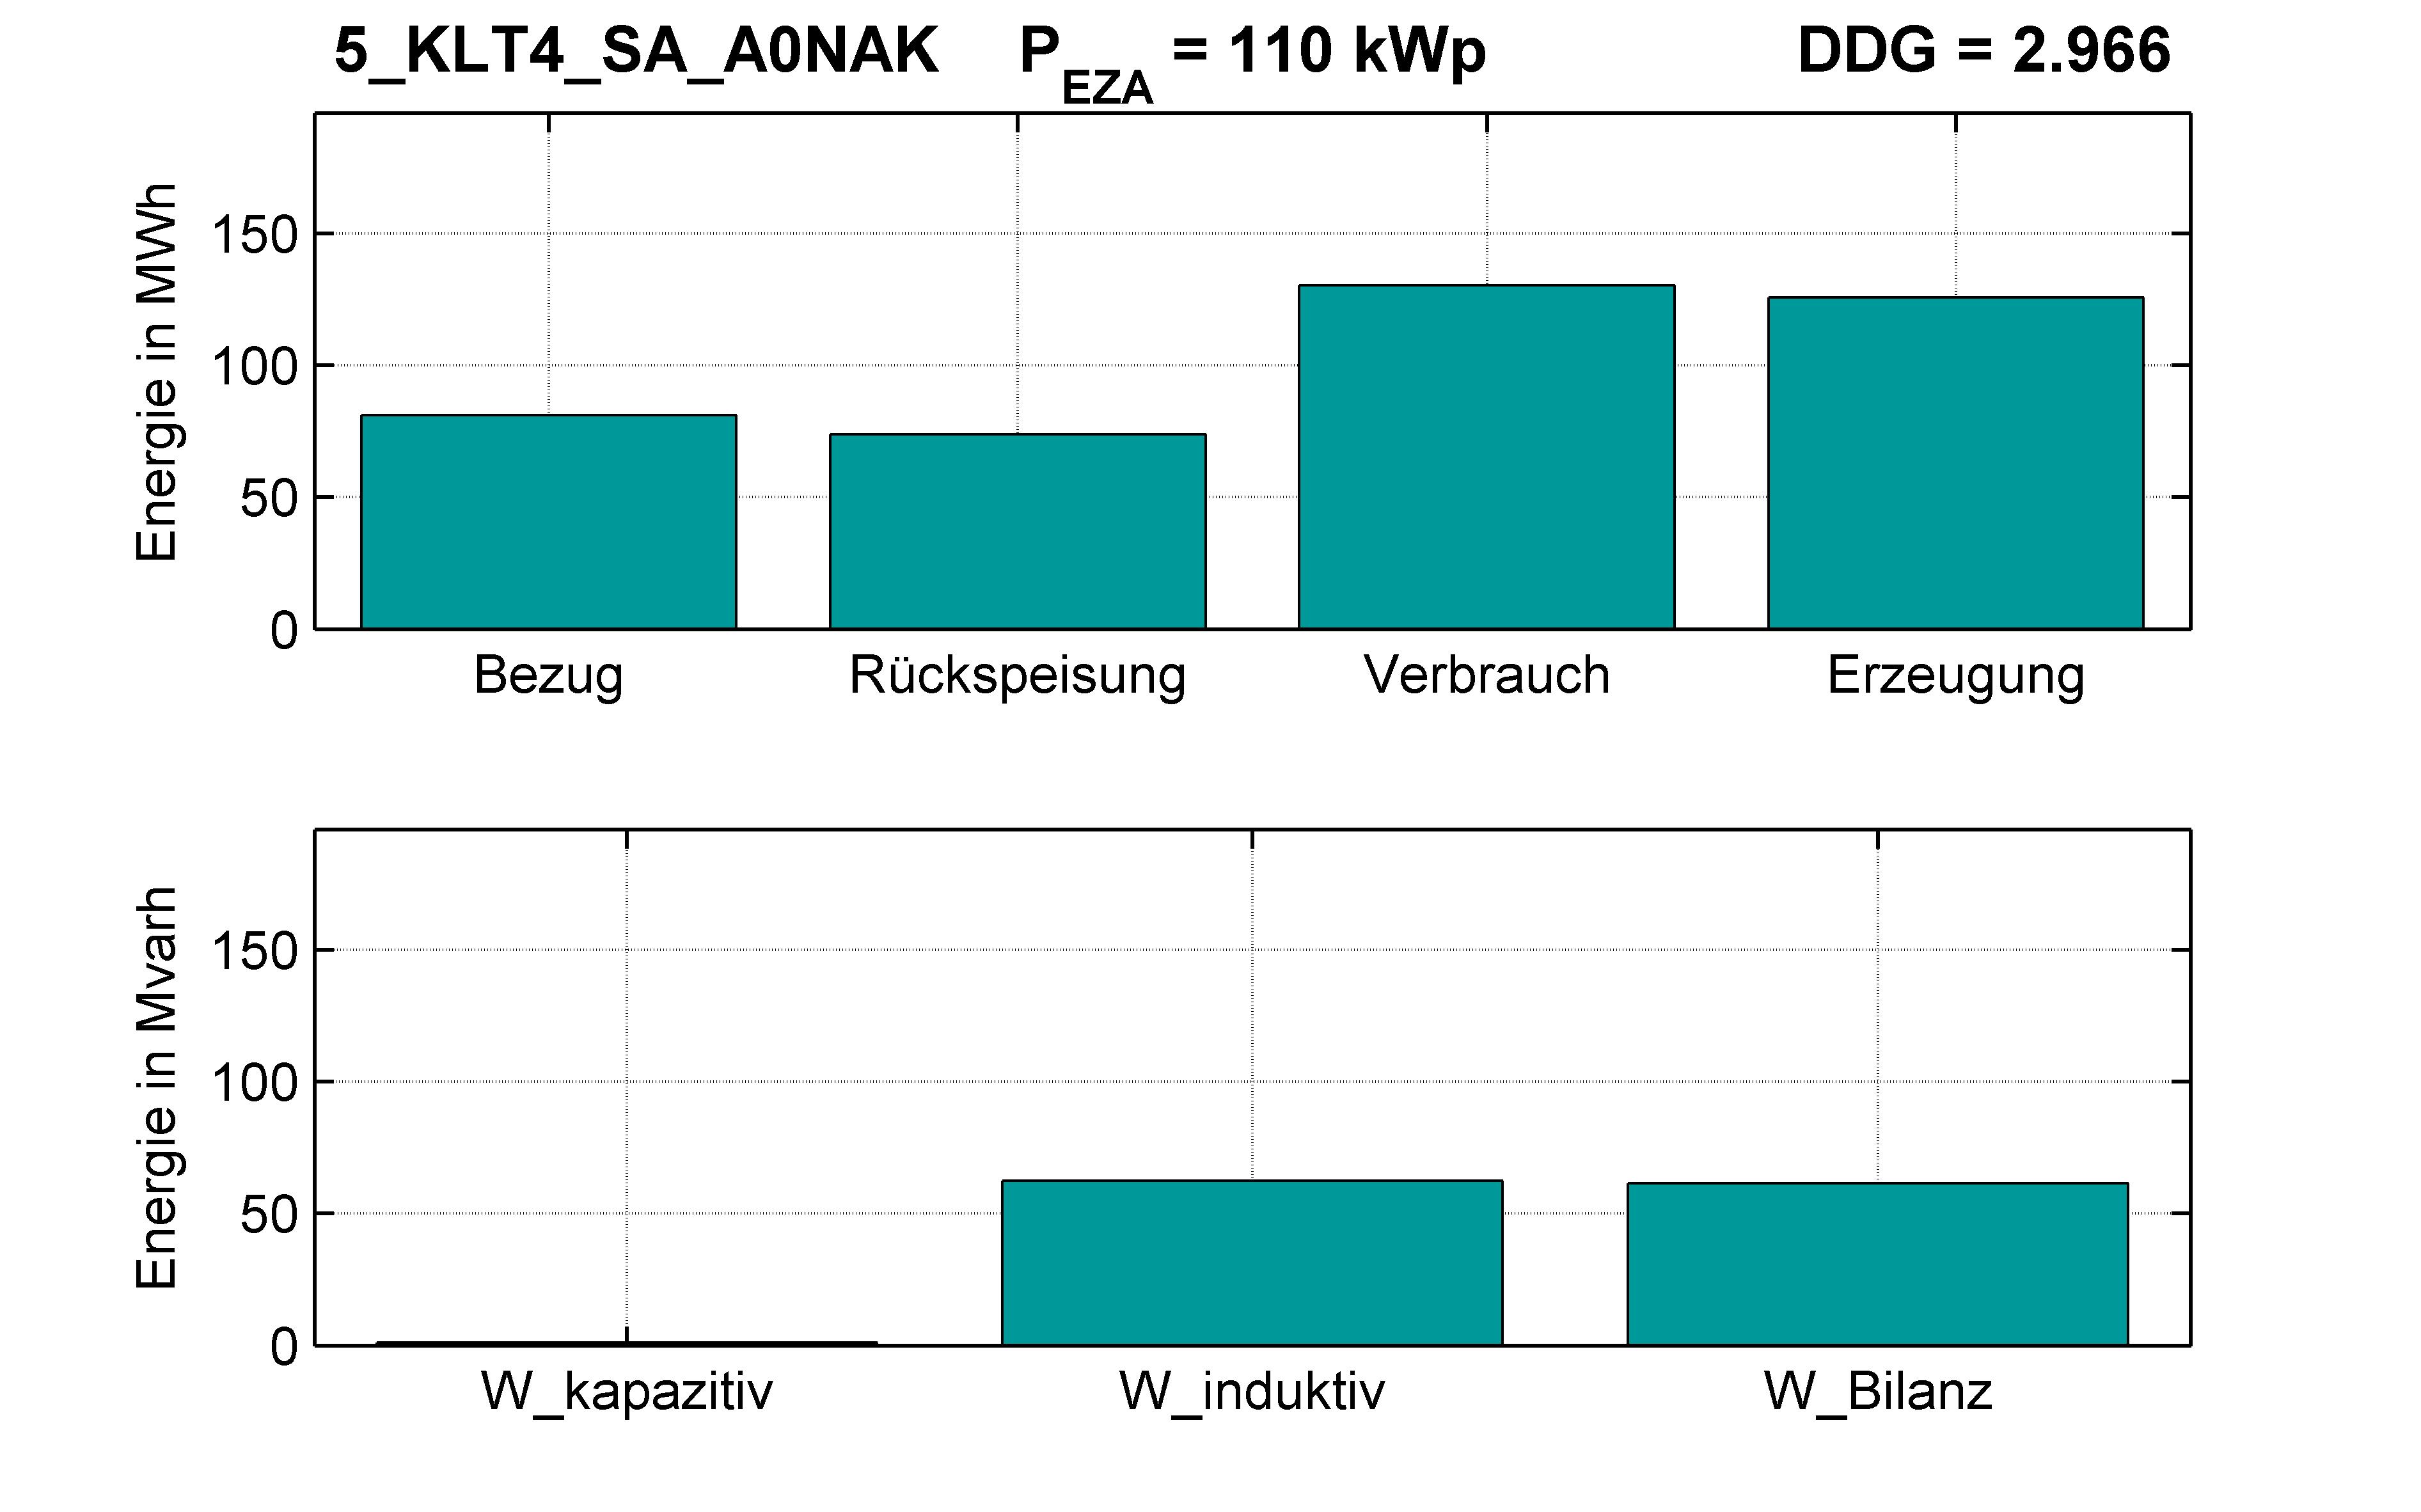 KLT4 | STATION (SA) A0NAK | PQ-Bilanz